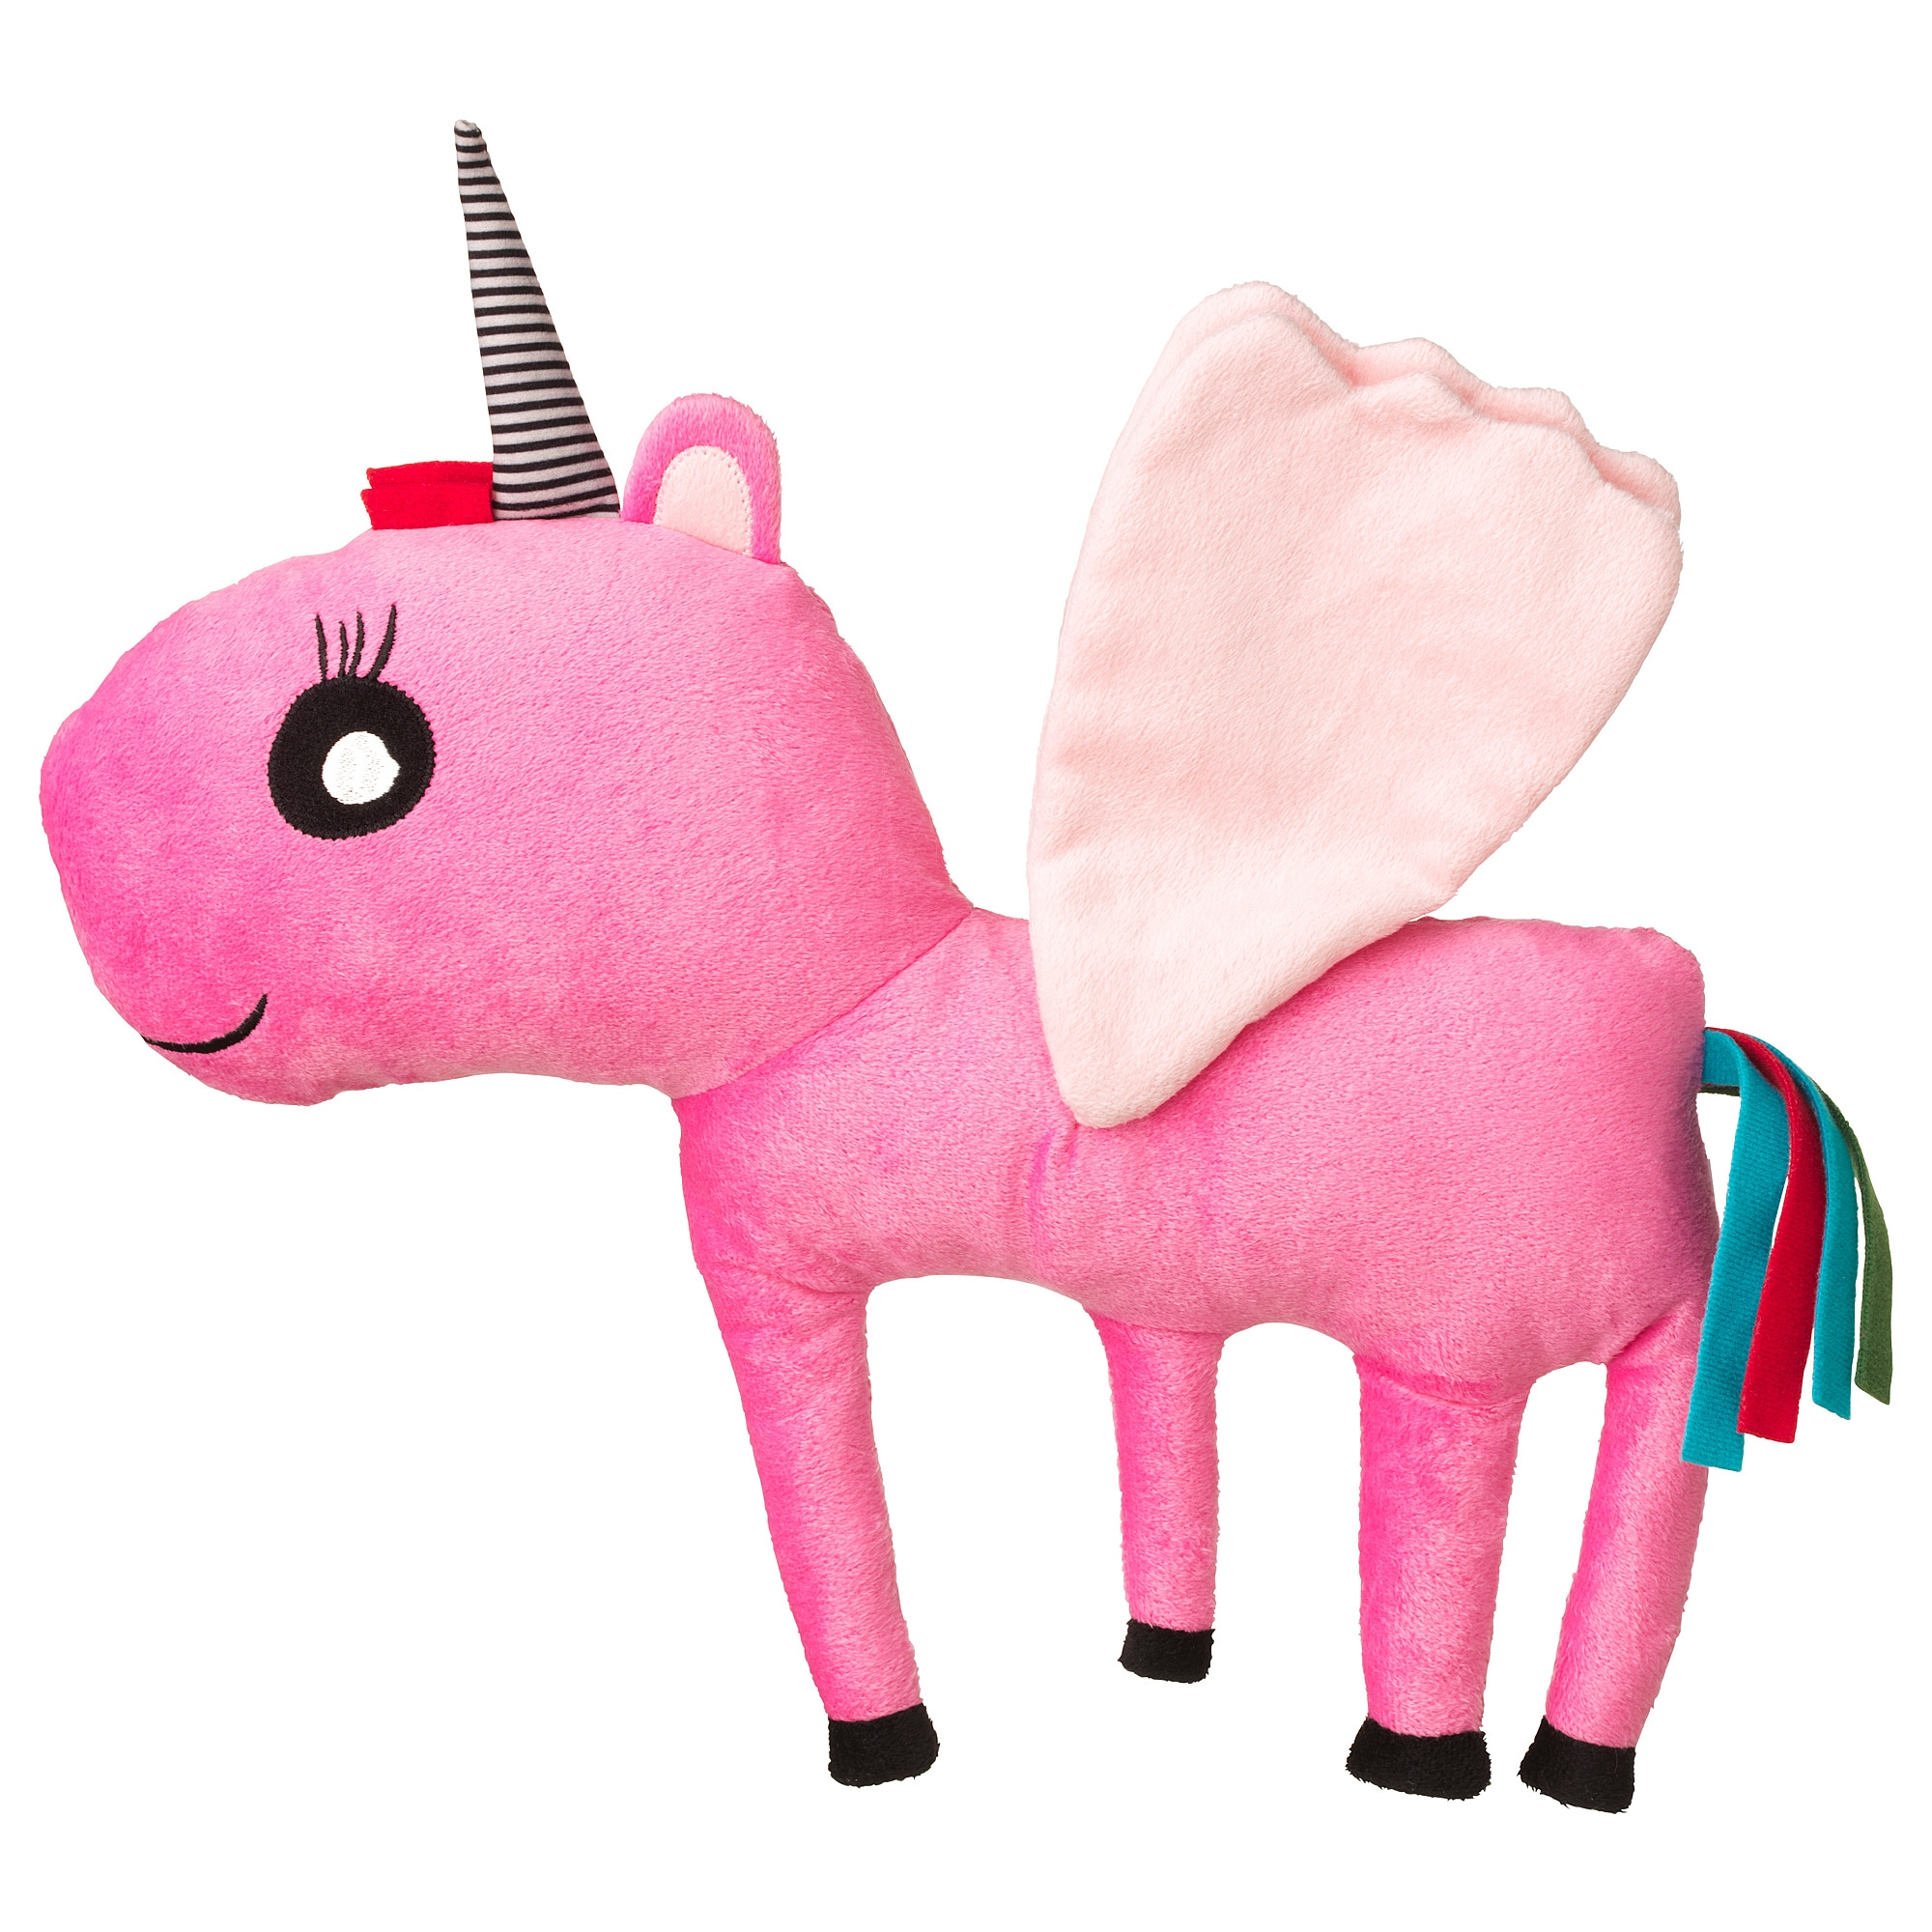 Мягкая игрушка САГОСКАТТ артикуль № 704.093.59 в наличии. Онлайн магазин IKEA РБ. Недорогая доставка и монтаж.